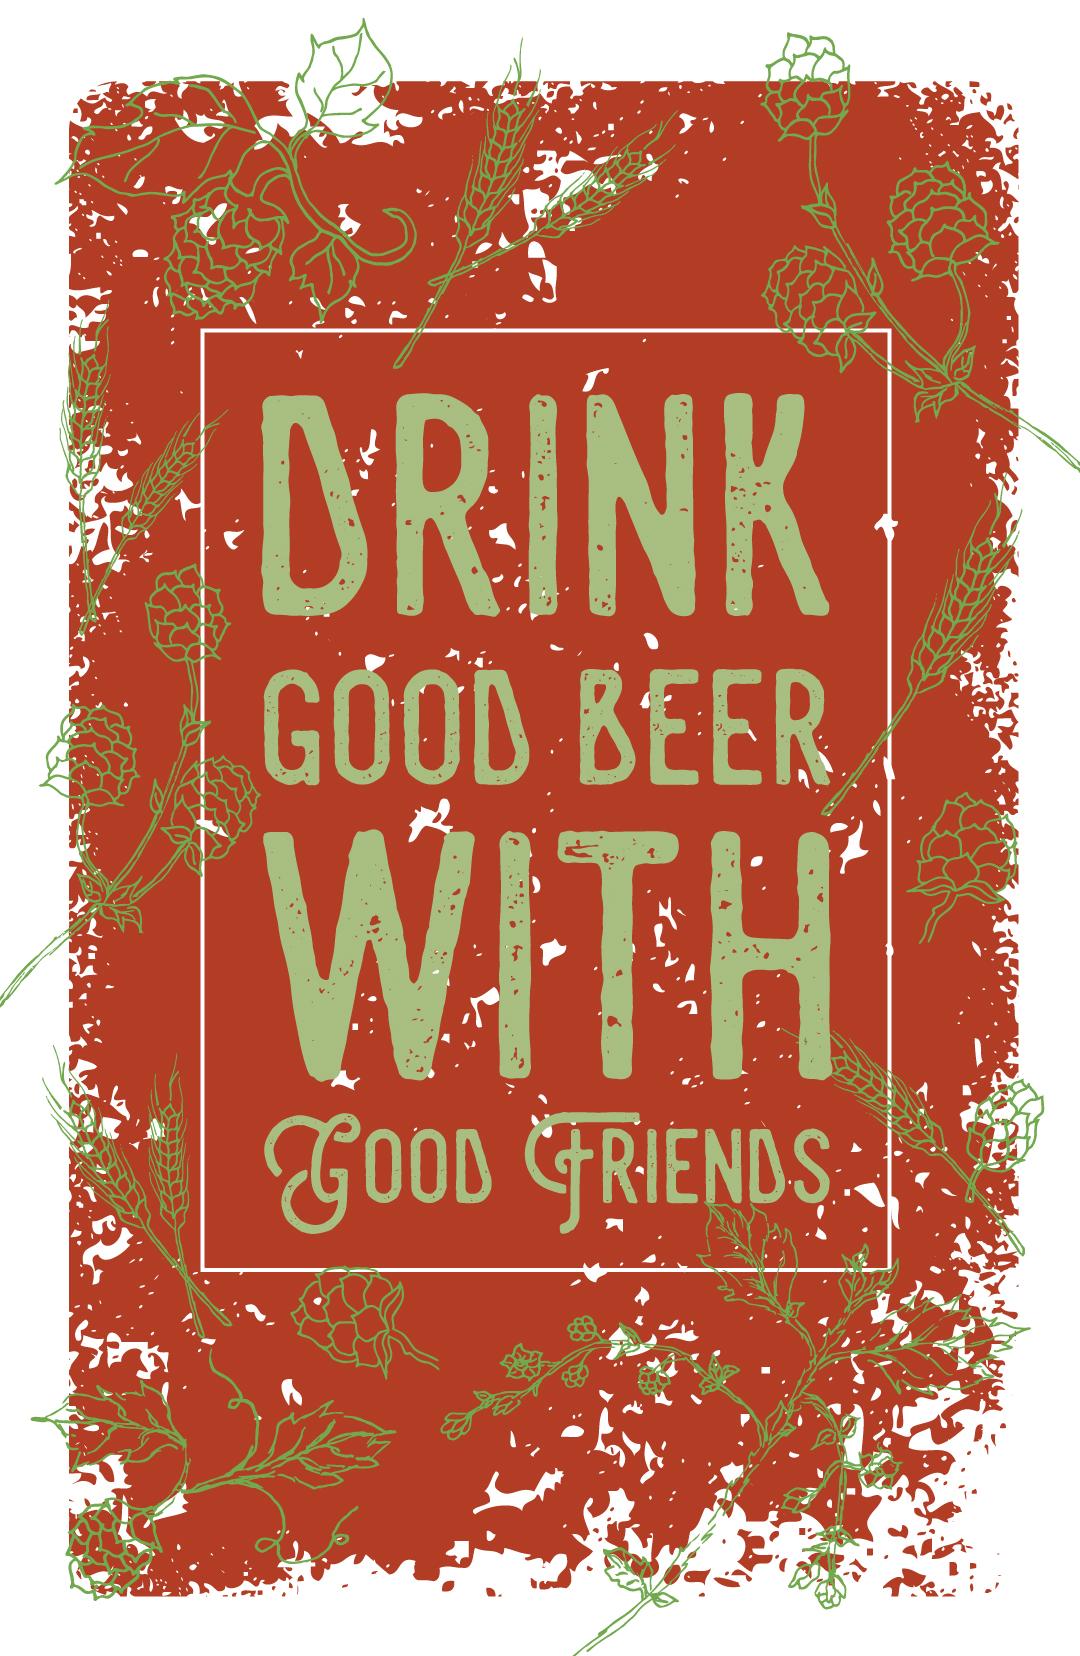 Craft+Beer+Poster-01.jpg